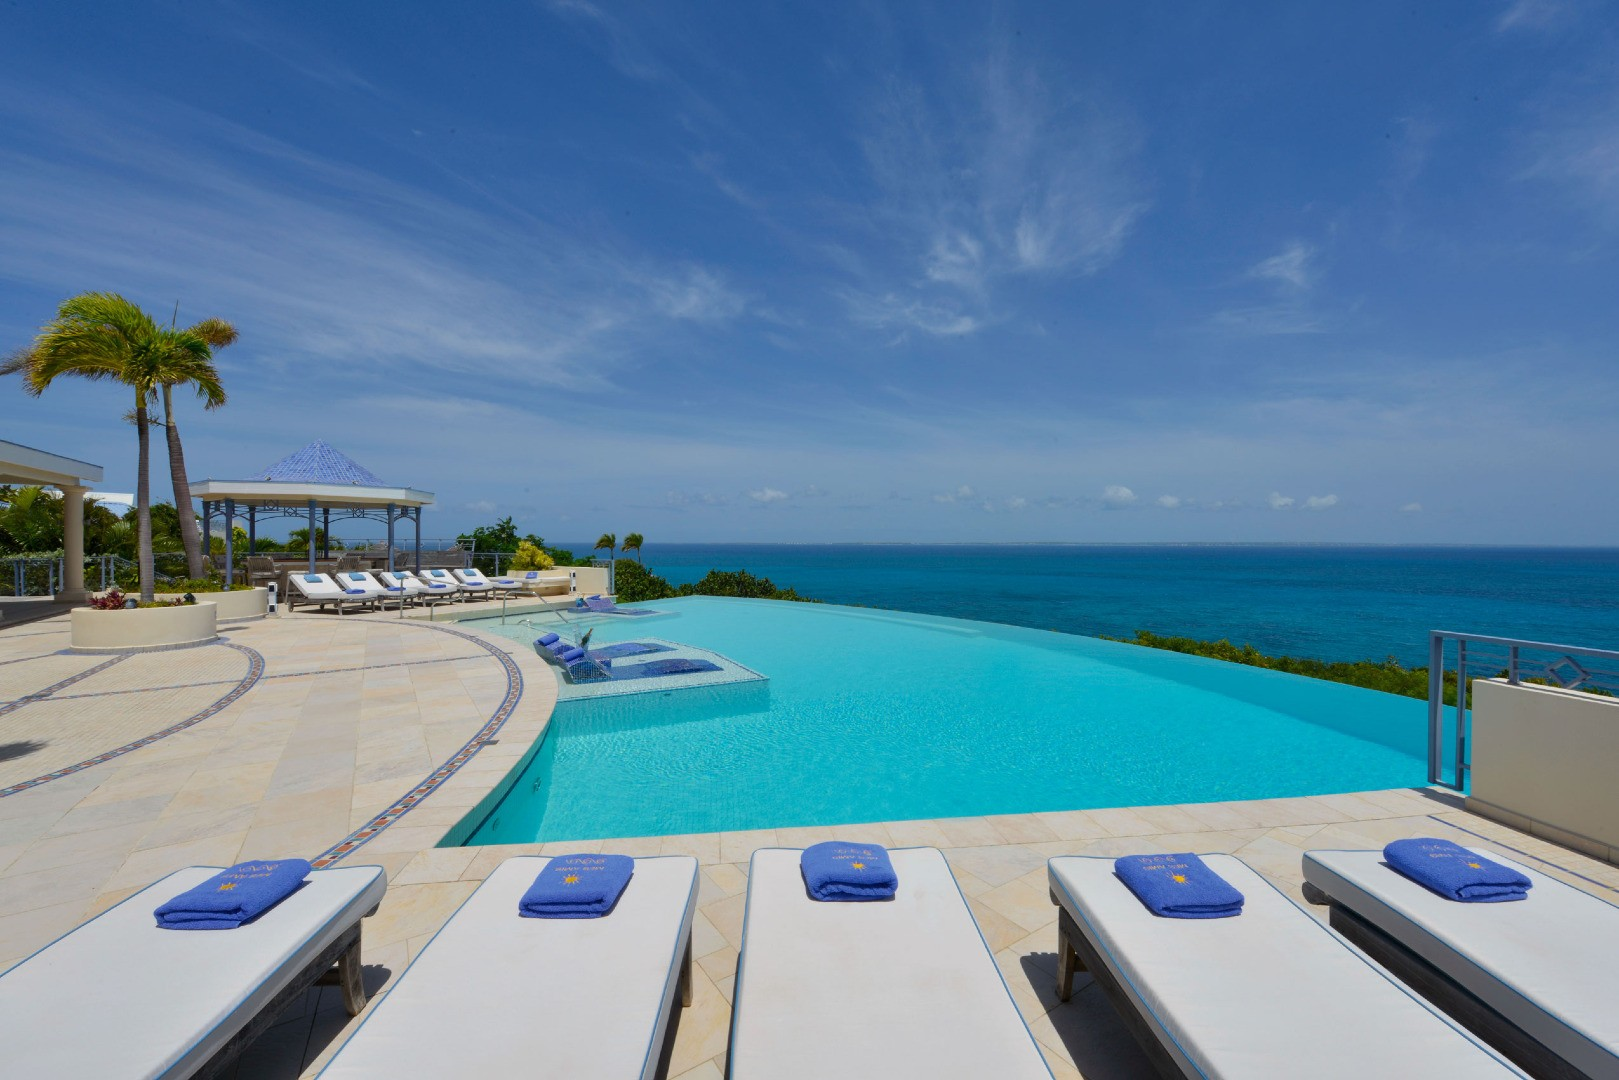 villa st maarten, st martin, paradise, tropical, pool, oasis